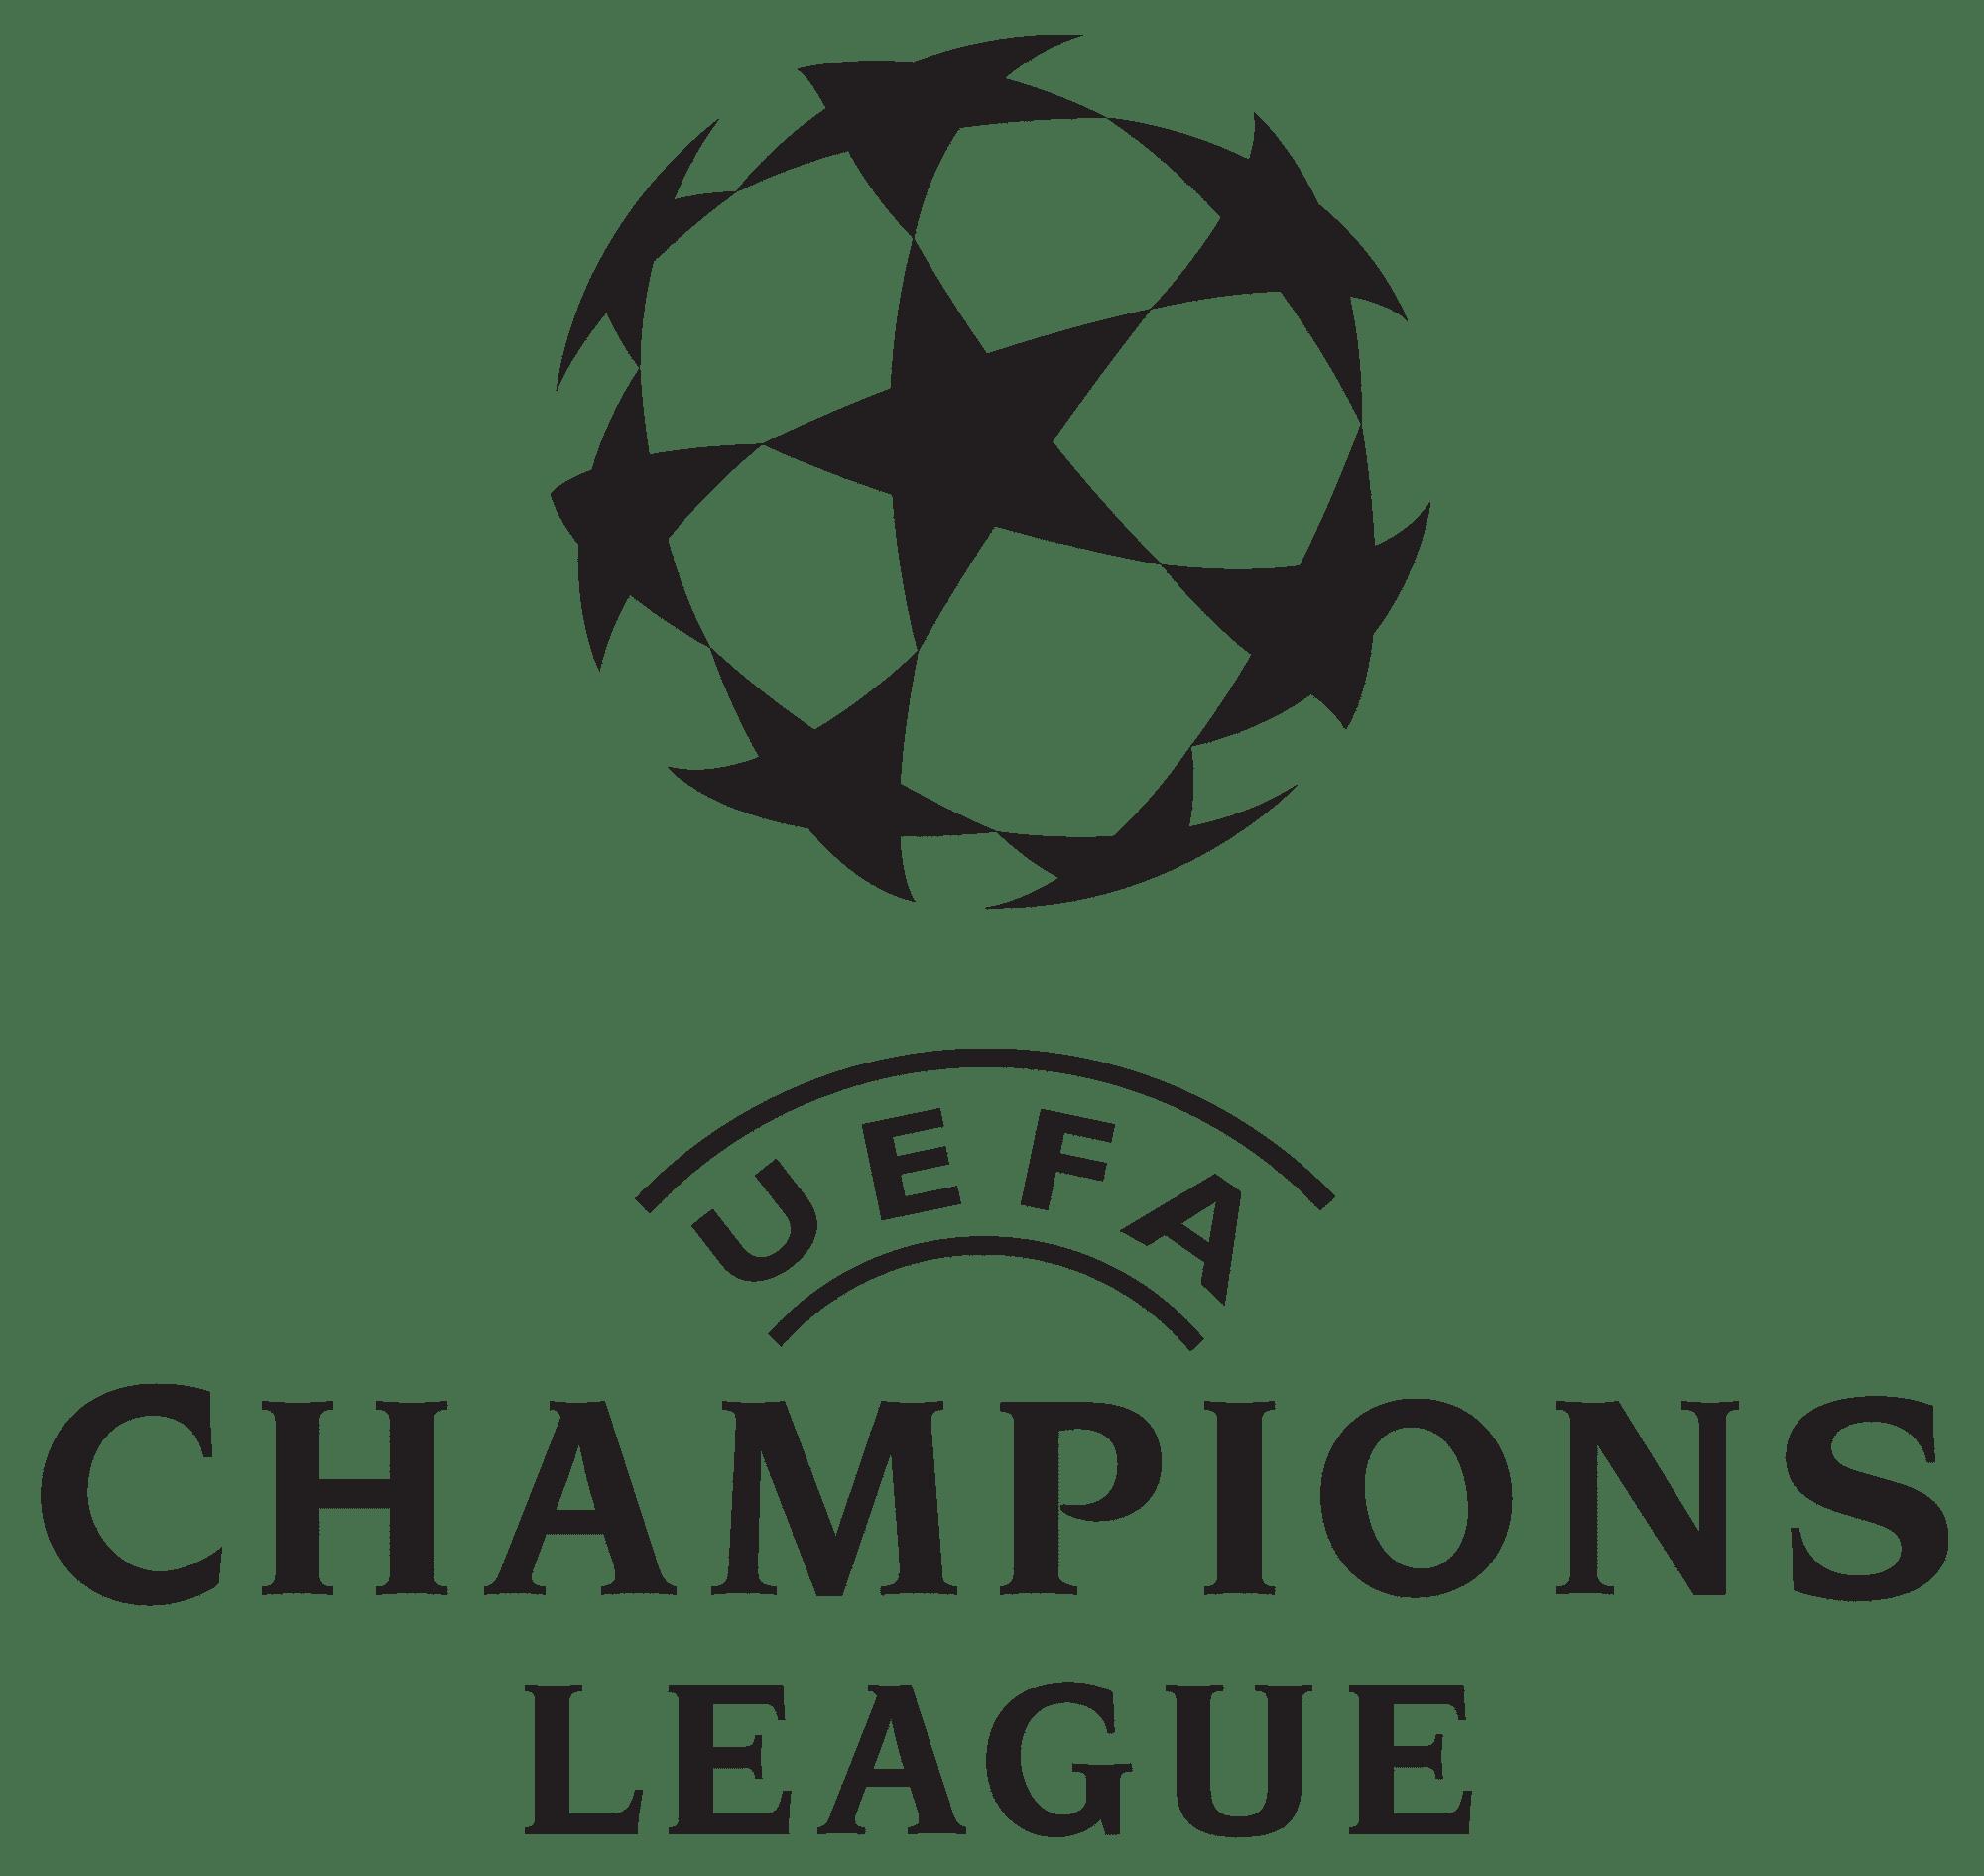 champions-league-stream-logo